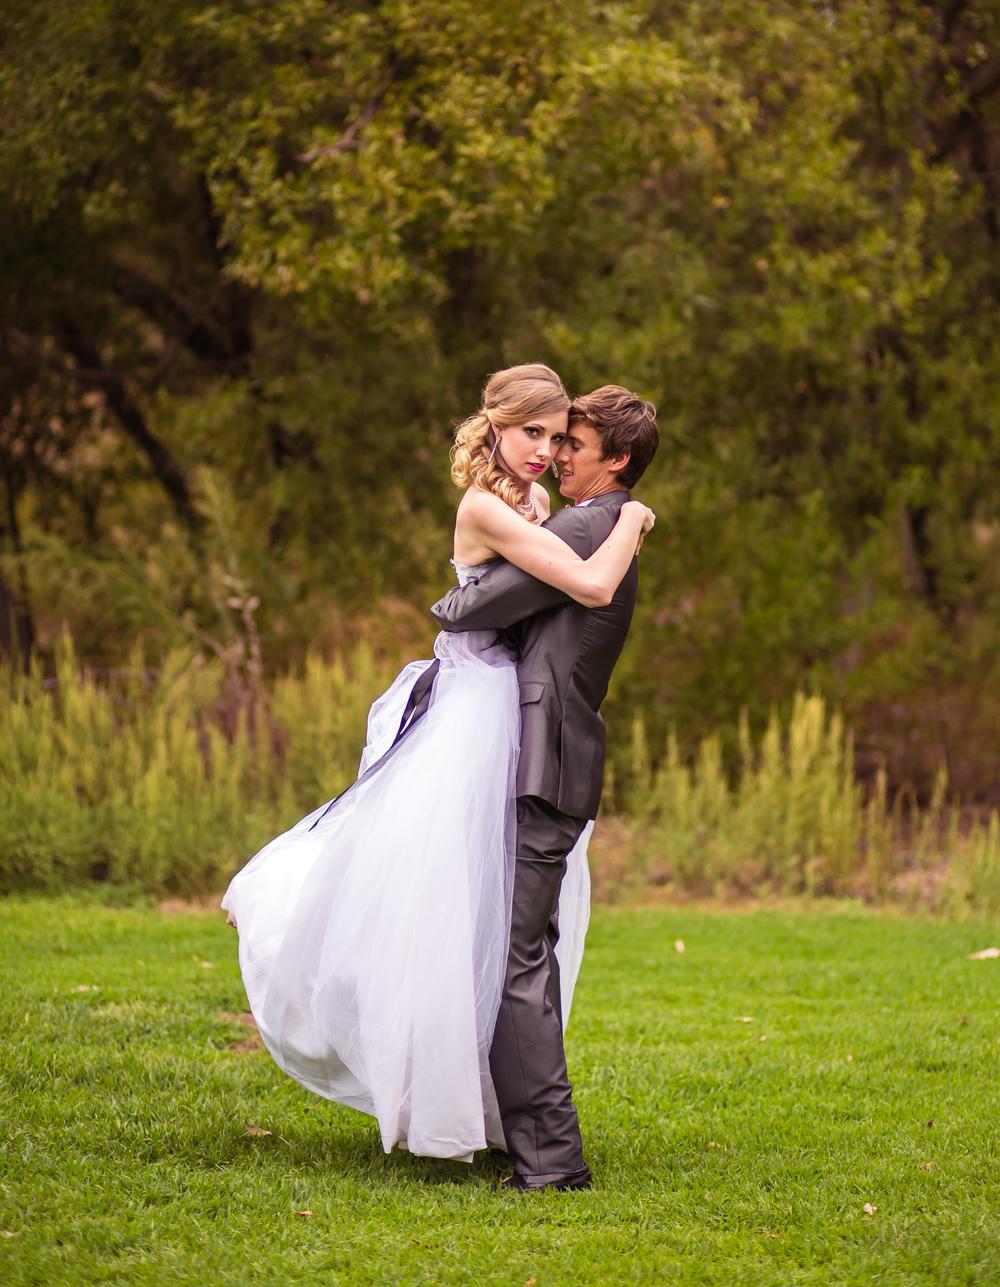 brides-2128.jpg